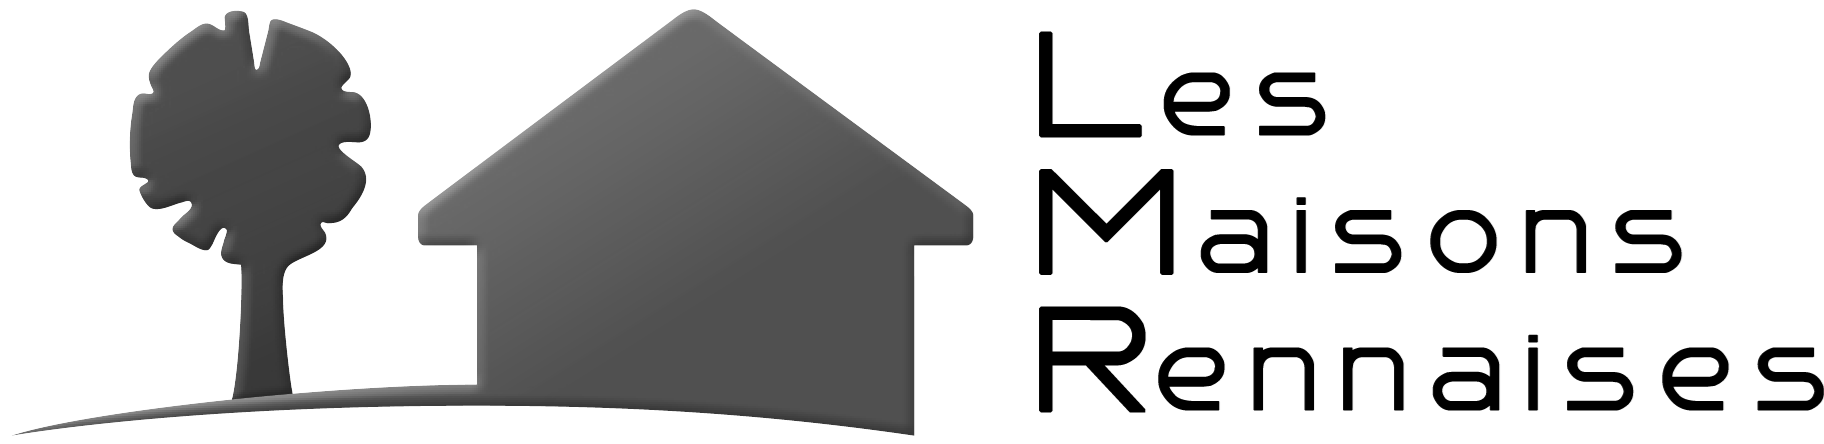 Maisons rennaises